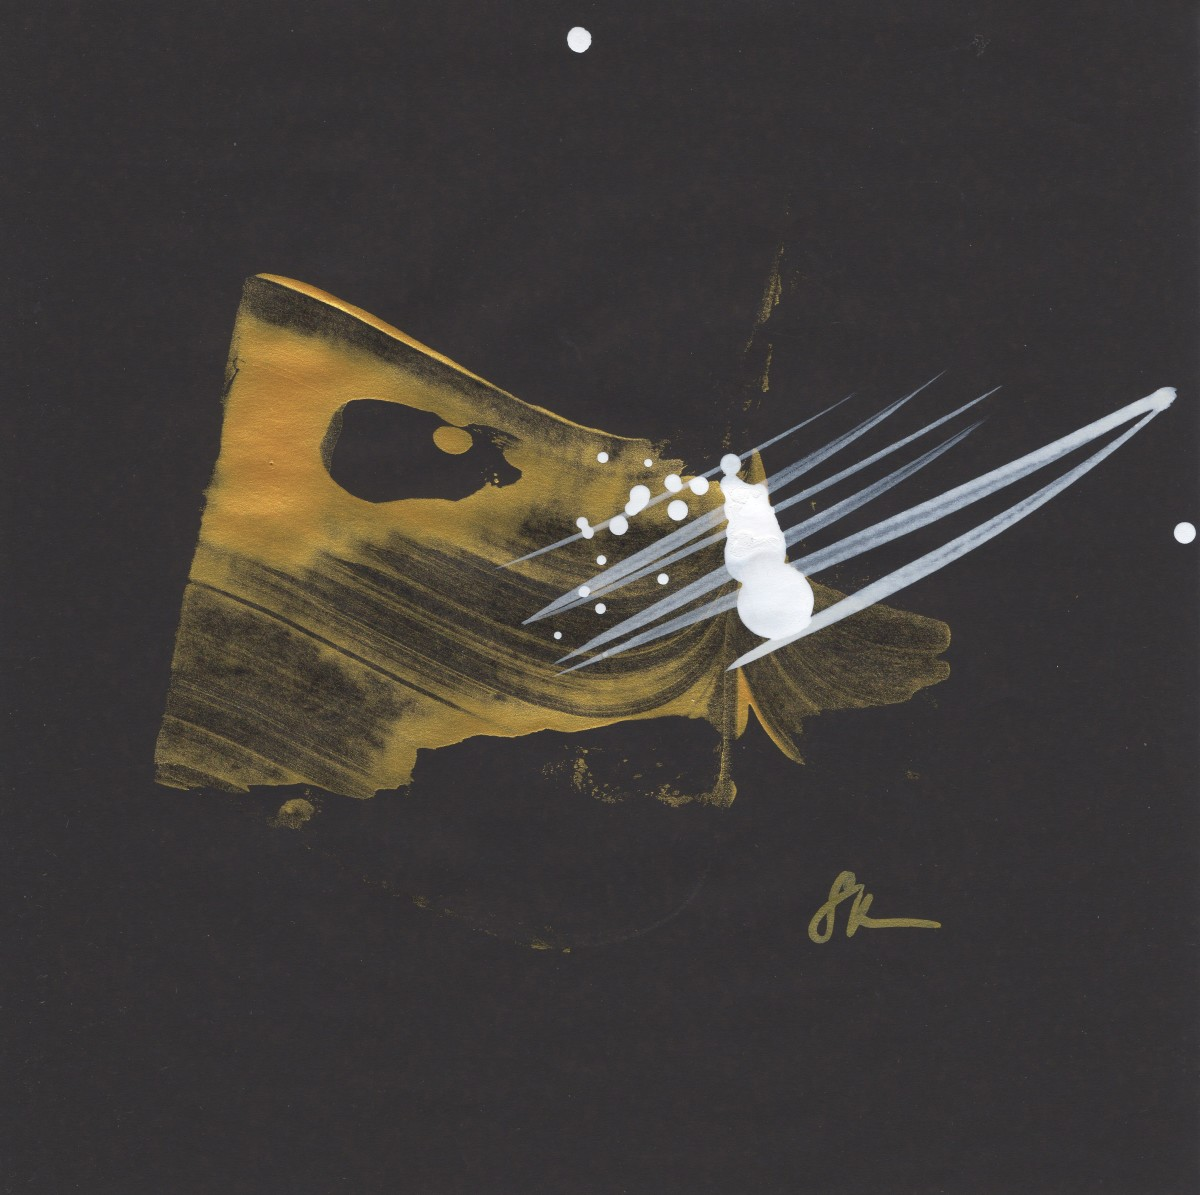 Origami Abstract 6 by Sonya Kleshik